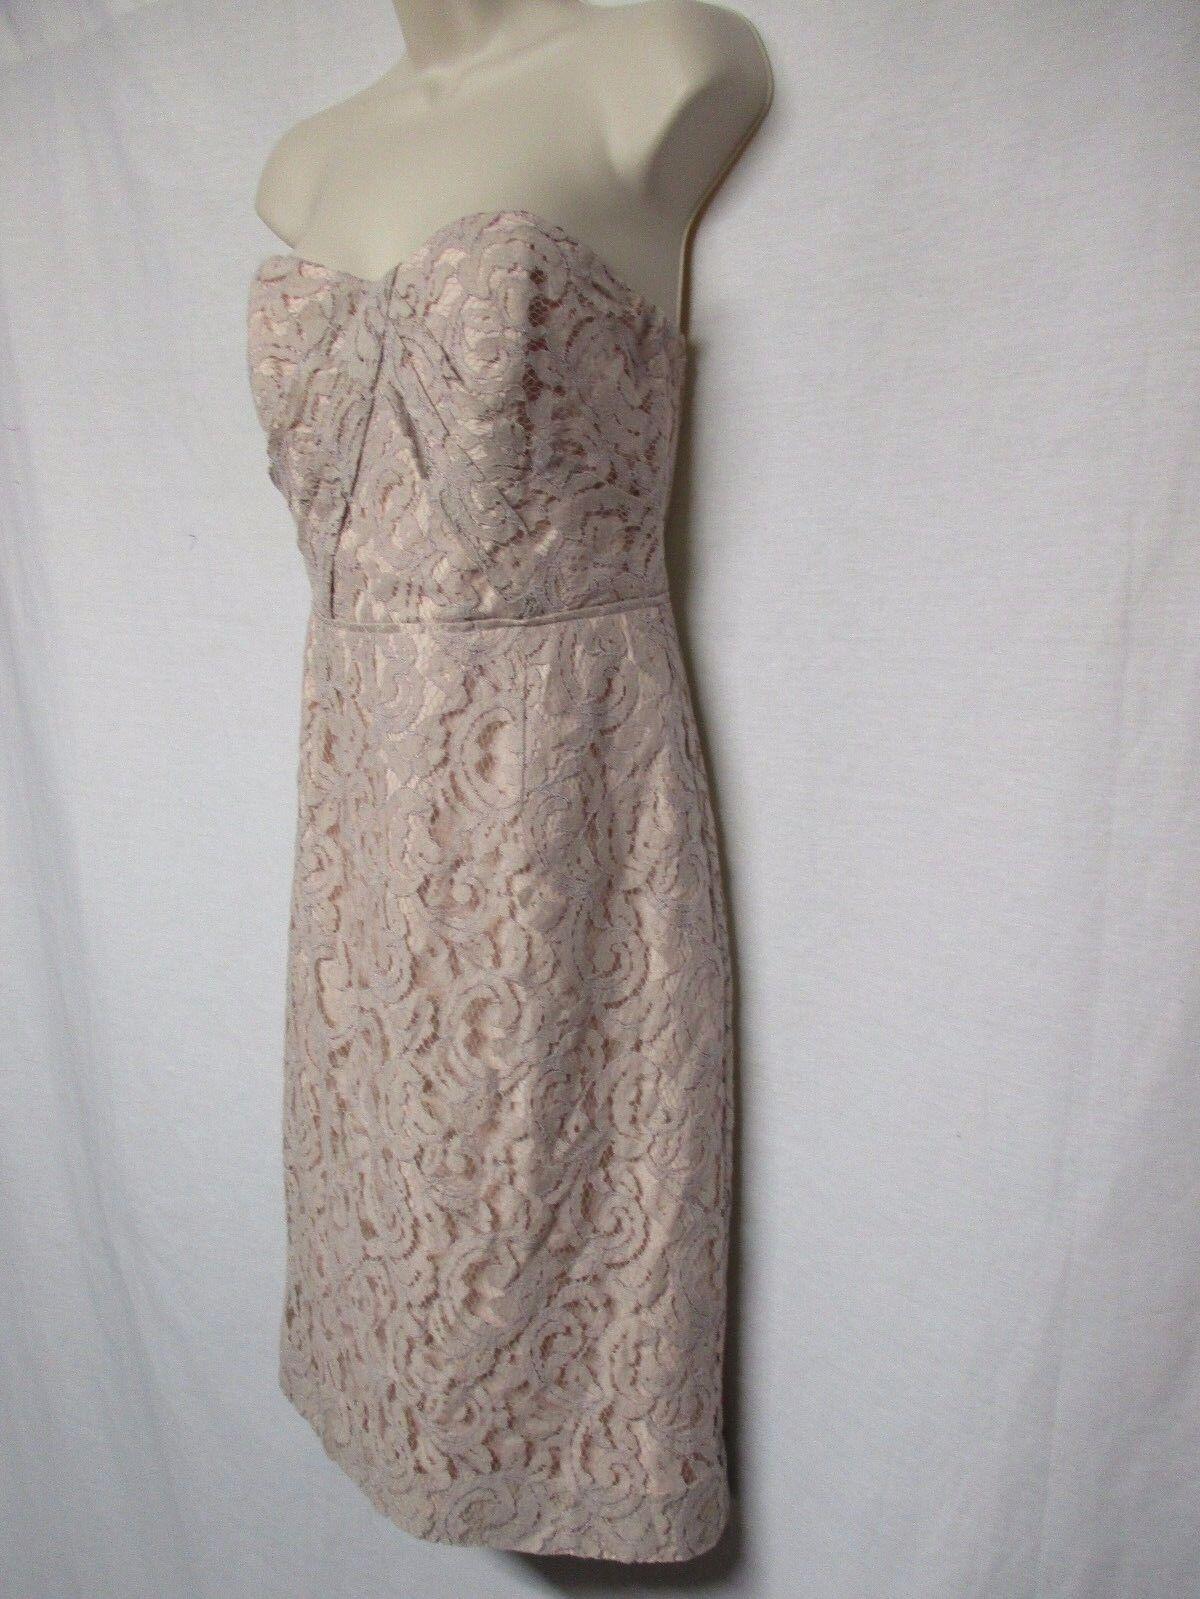 J. CREW CATALINA STRAPLESS LACE LIGHT MAULE DRESS BRIDESMAID BRIDESMAID BRIDESMAID SIZE 2   a4 3be1a8